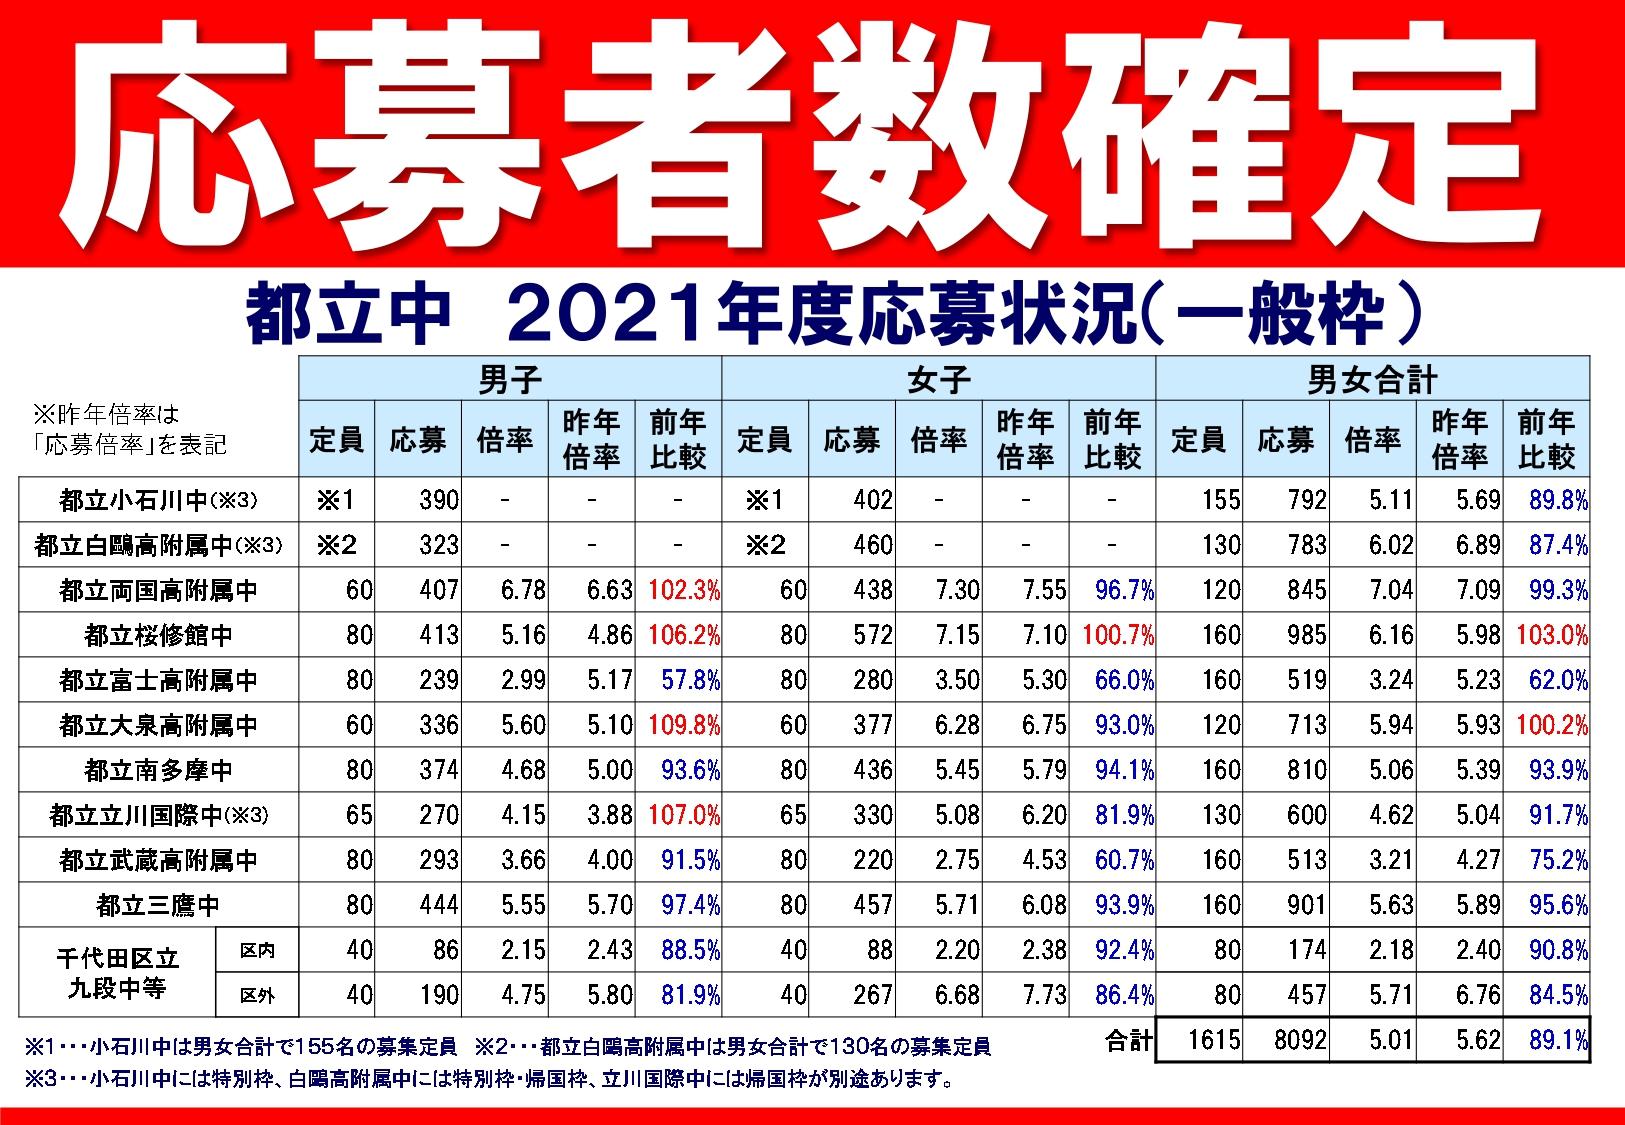 2021_%e5%bf%9c%e5%8b%9f%e8%80%85%e7%8a%b6%e6%b3%81_11%e6%a0%a1_page-0001